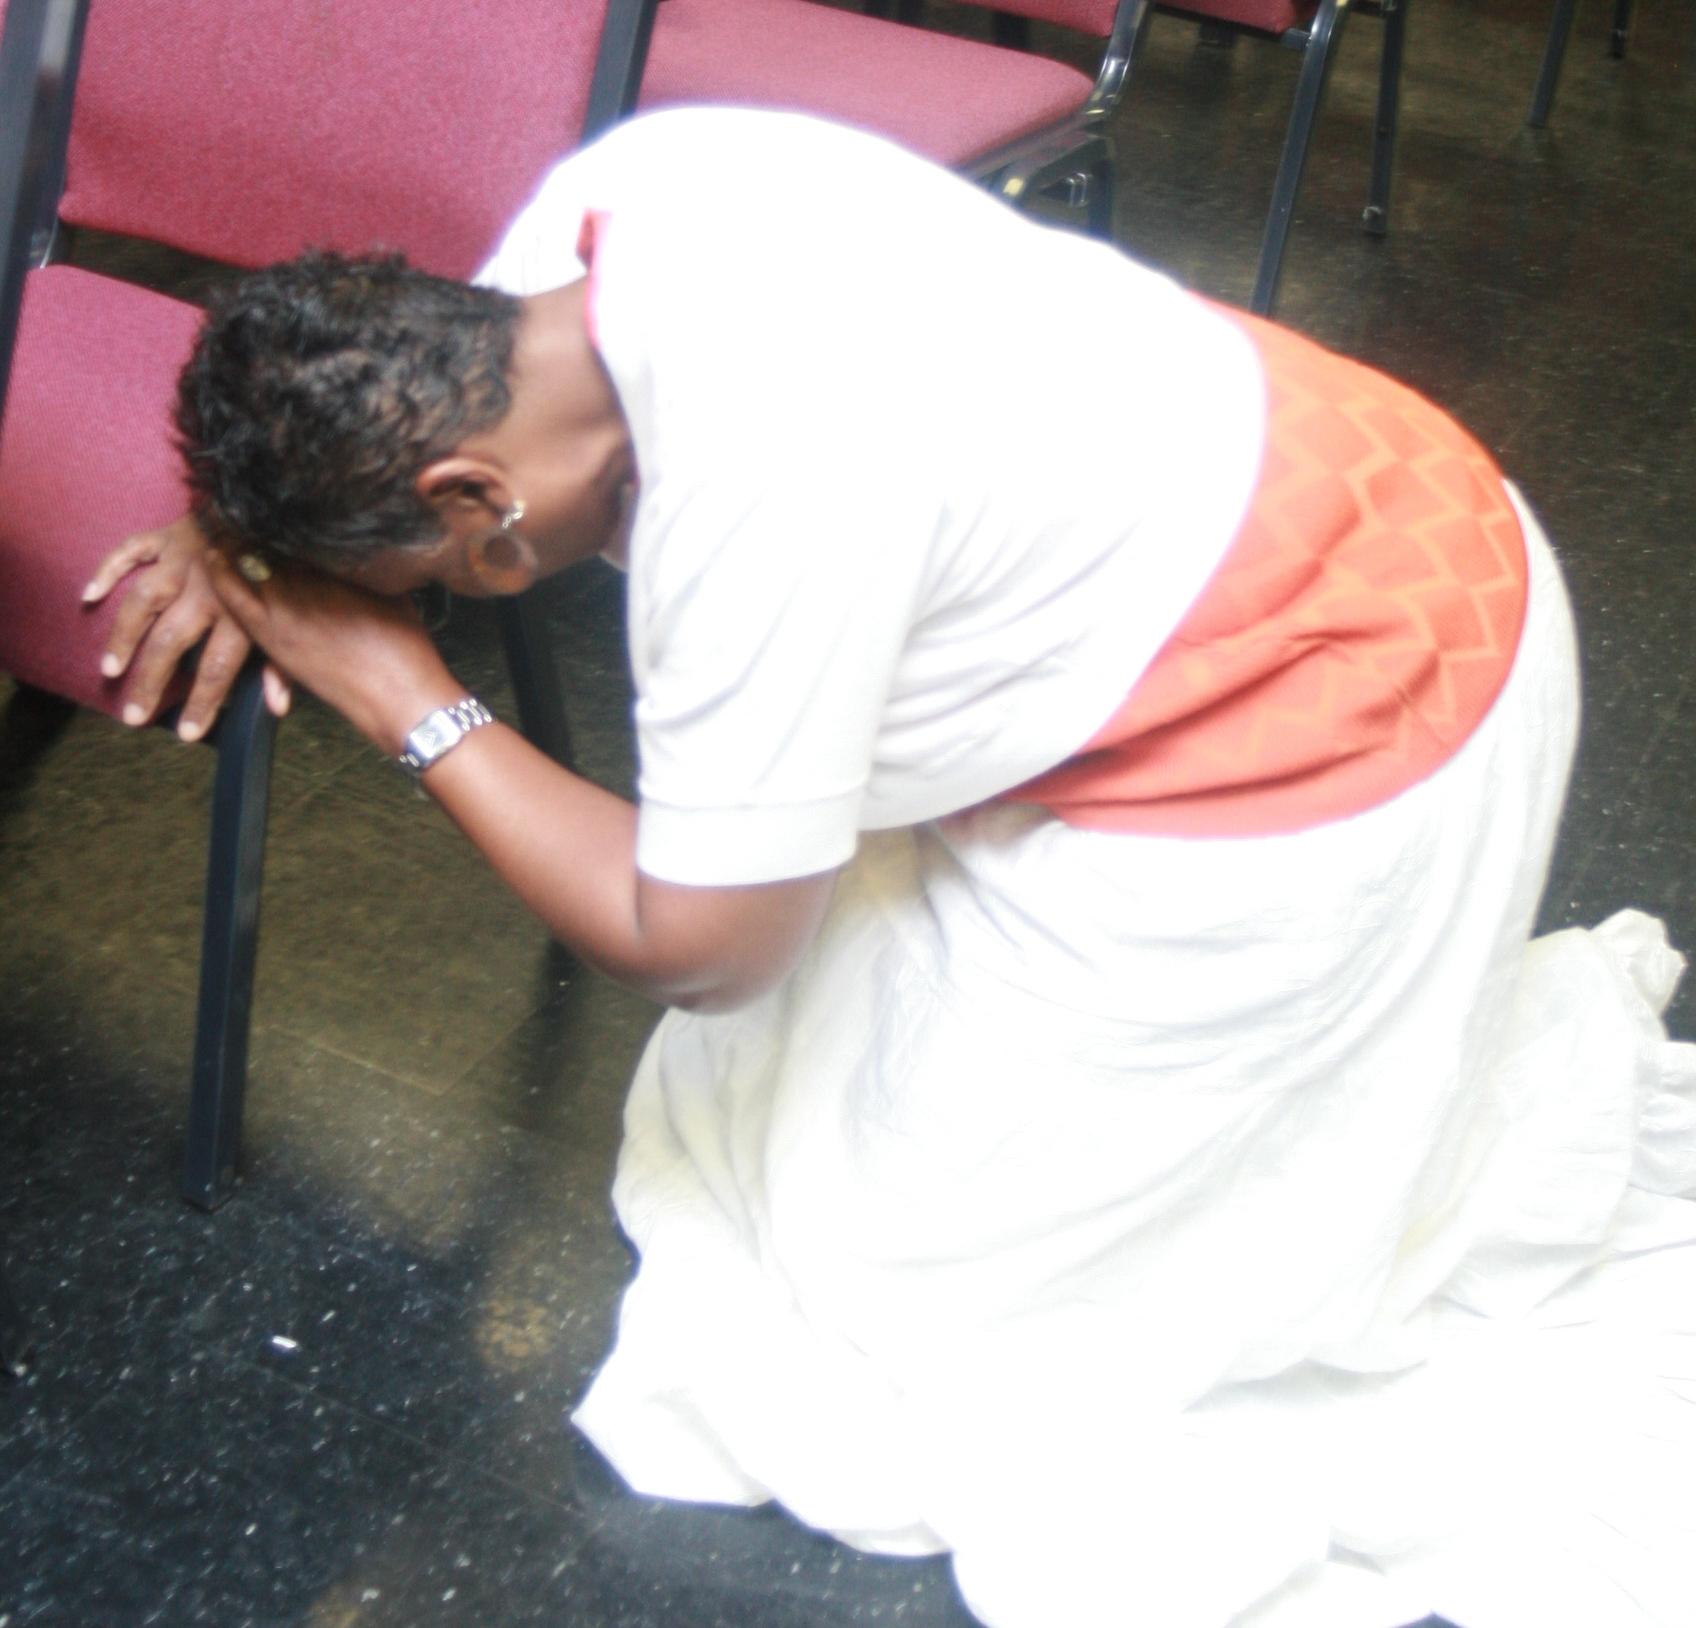 Praying Always With Perseverance